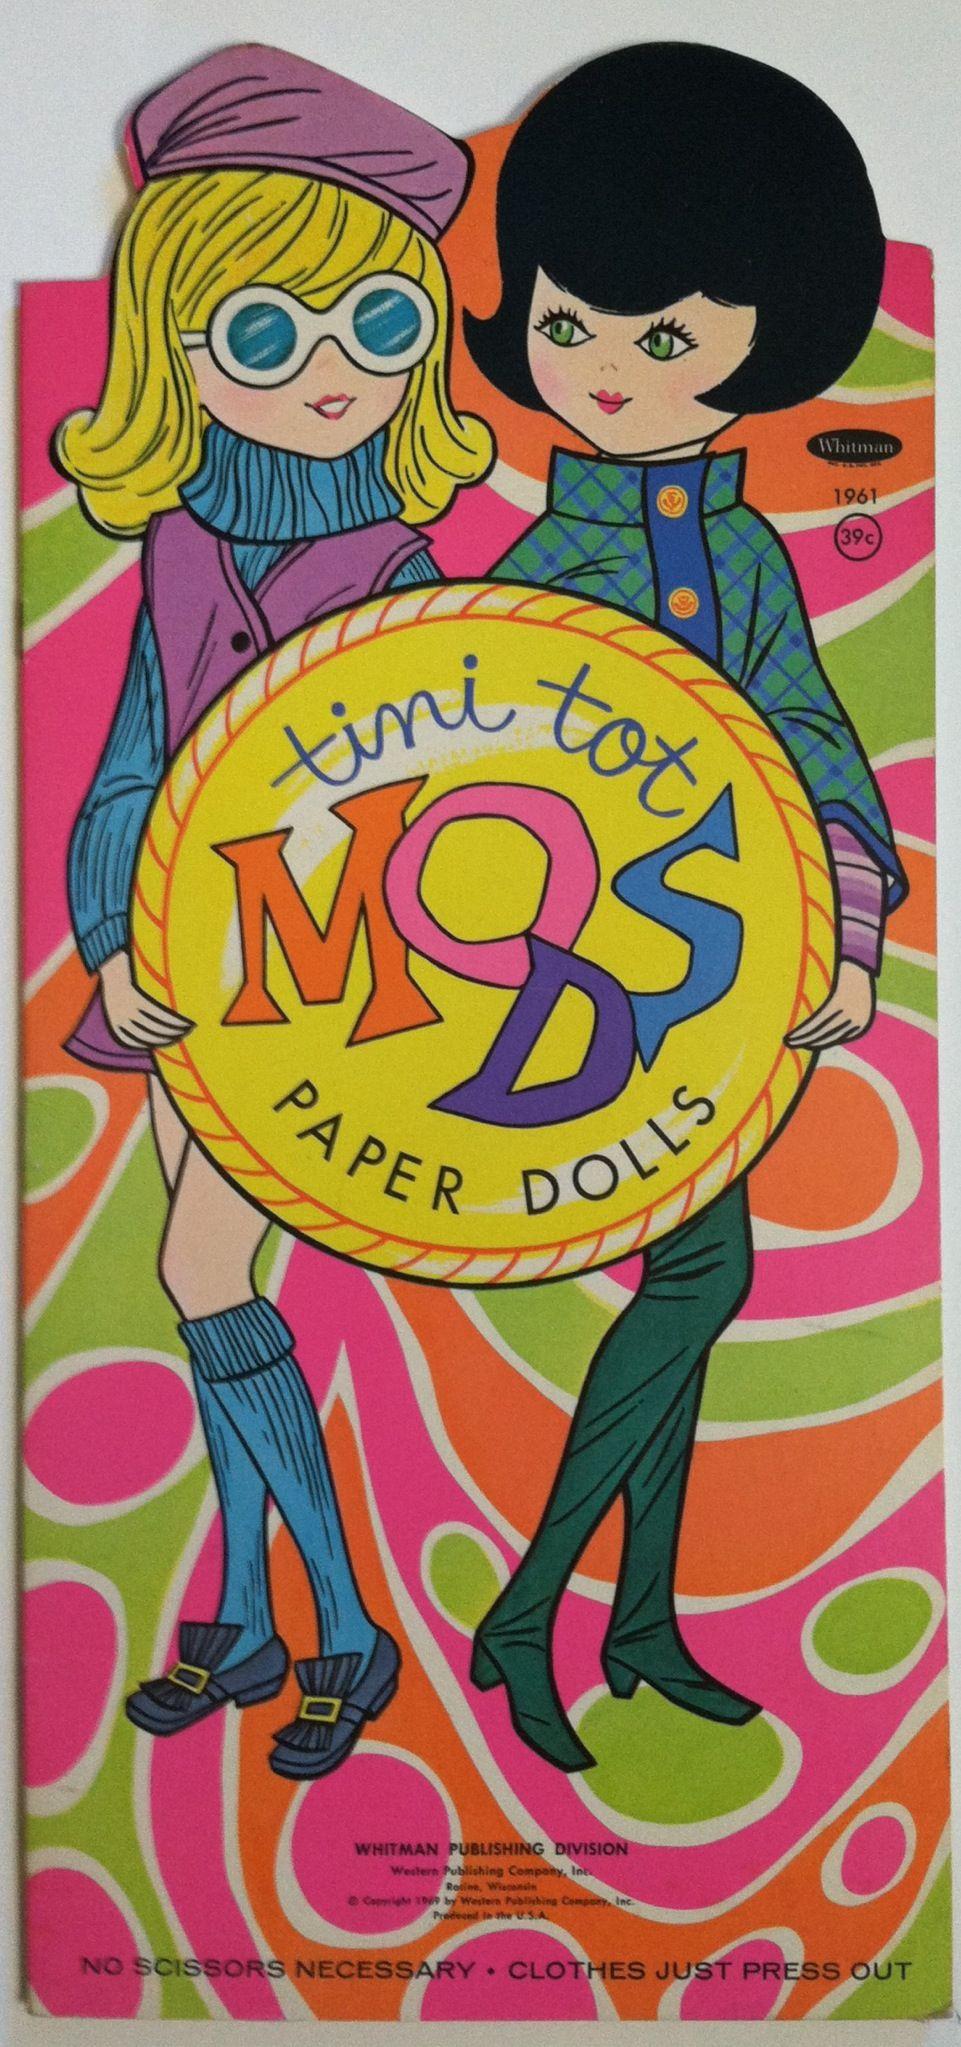 Tini Tot Mods Paper Dolls 1969. Whitman.